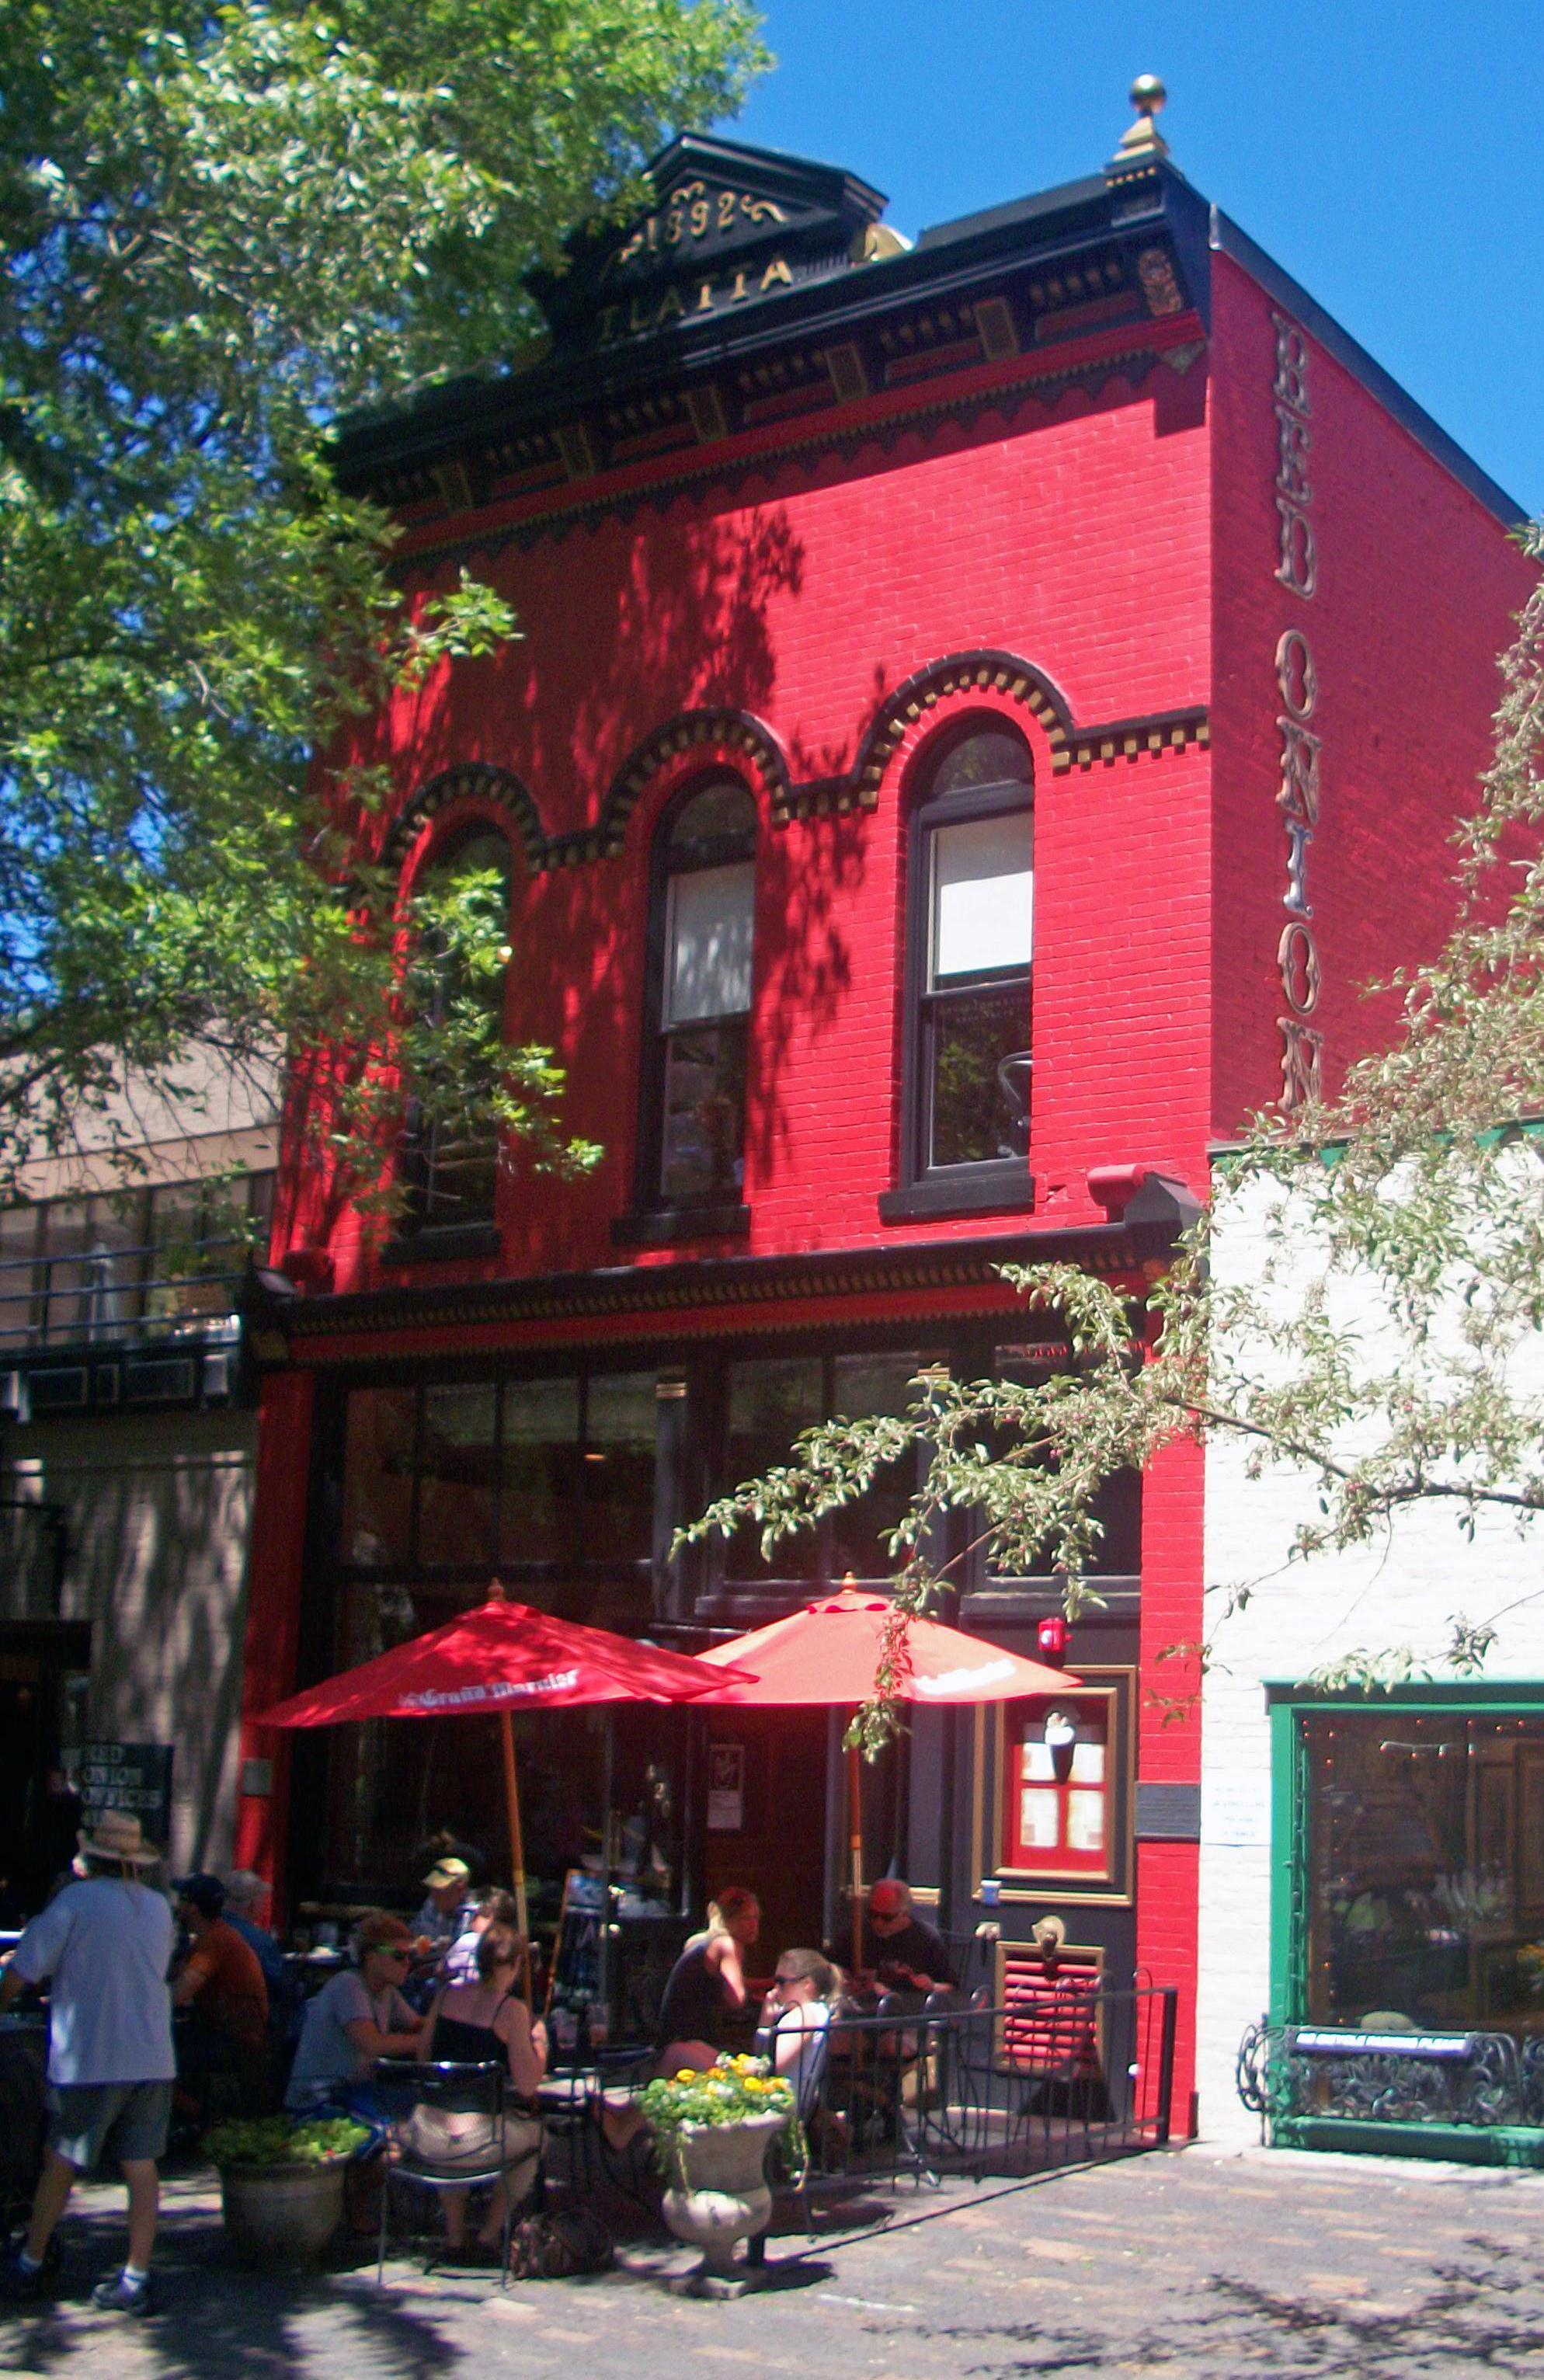 Red Onion Restaurant Woodstock New York